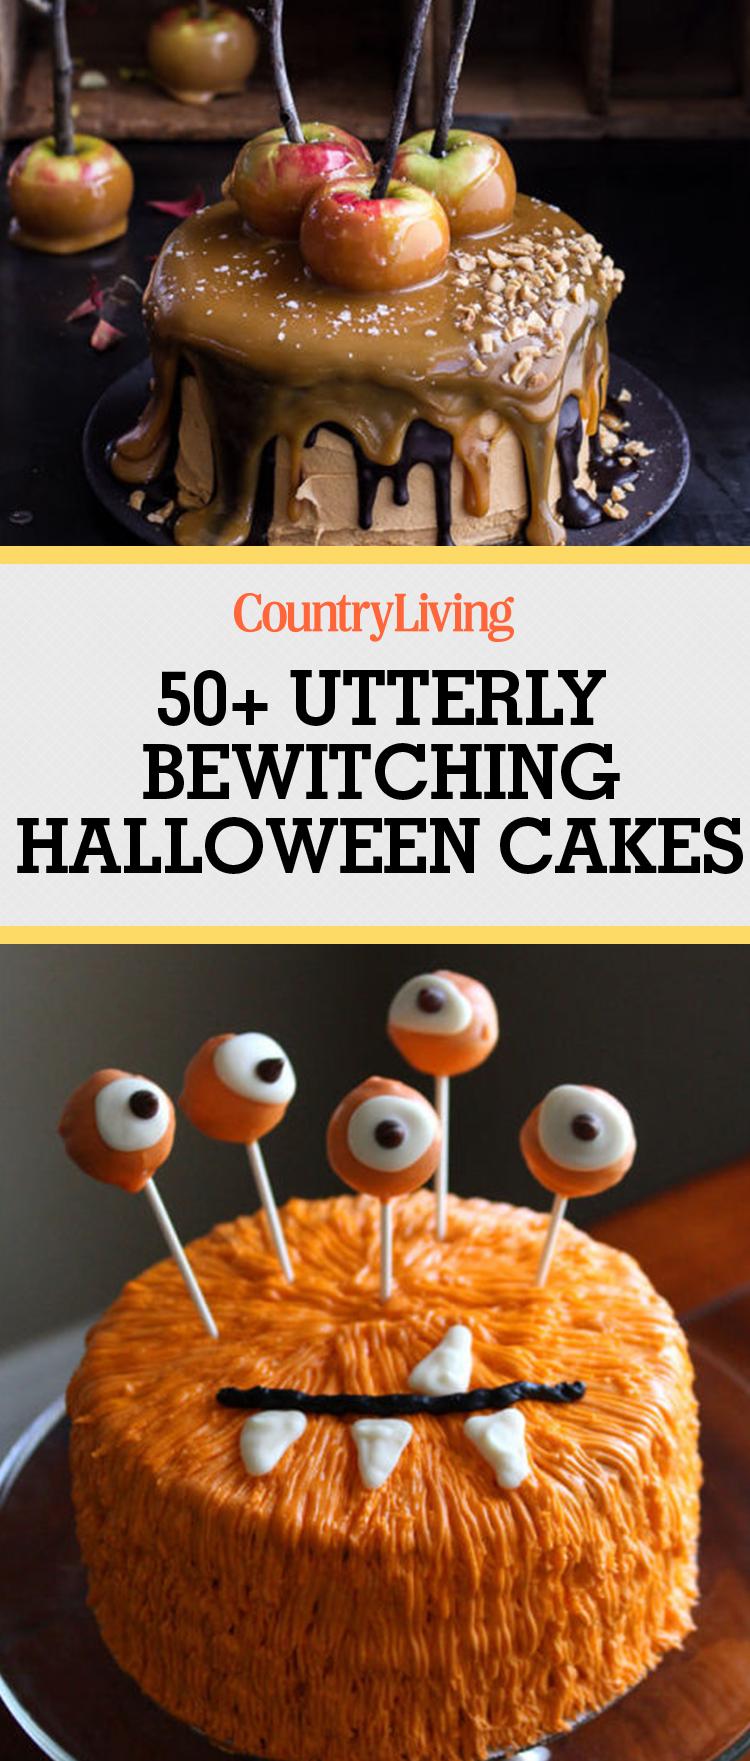 61 Easy Halloween Cakes - Recipes and Halloween Cake ...